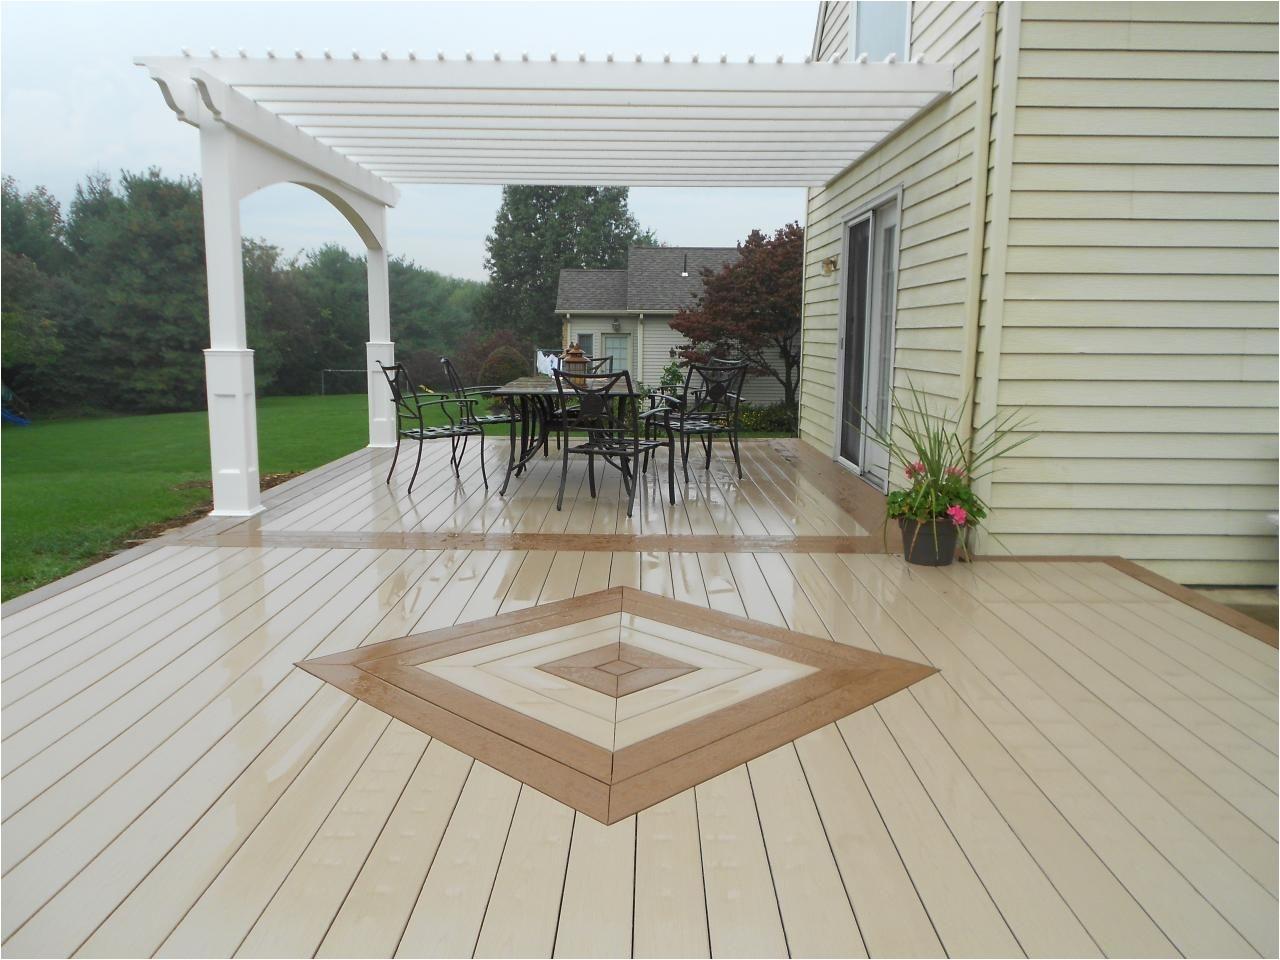 1045 best decks r usour decks images on pinterest in 2018 wood decks decks and outdoor patios